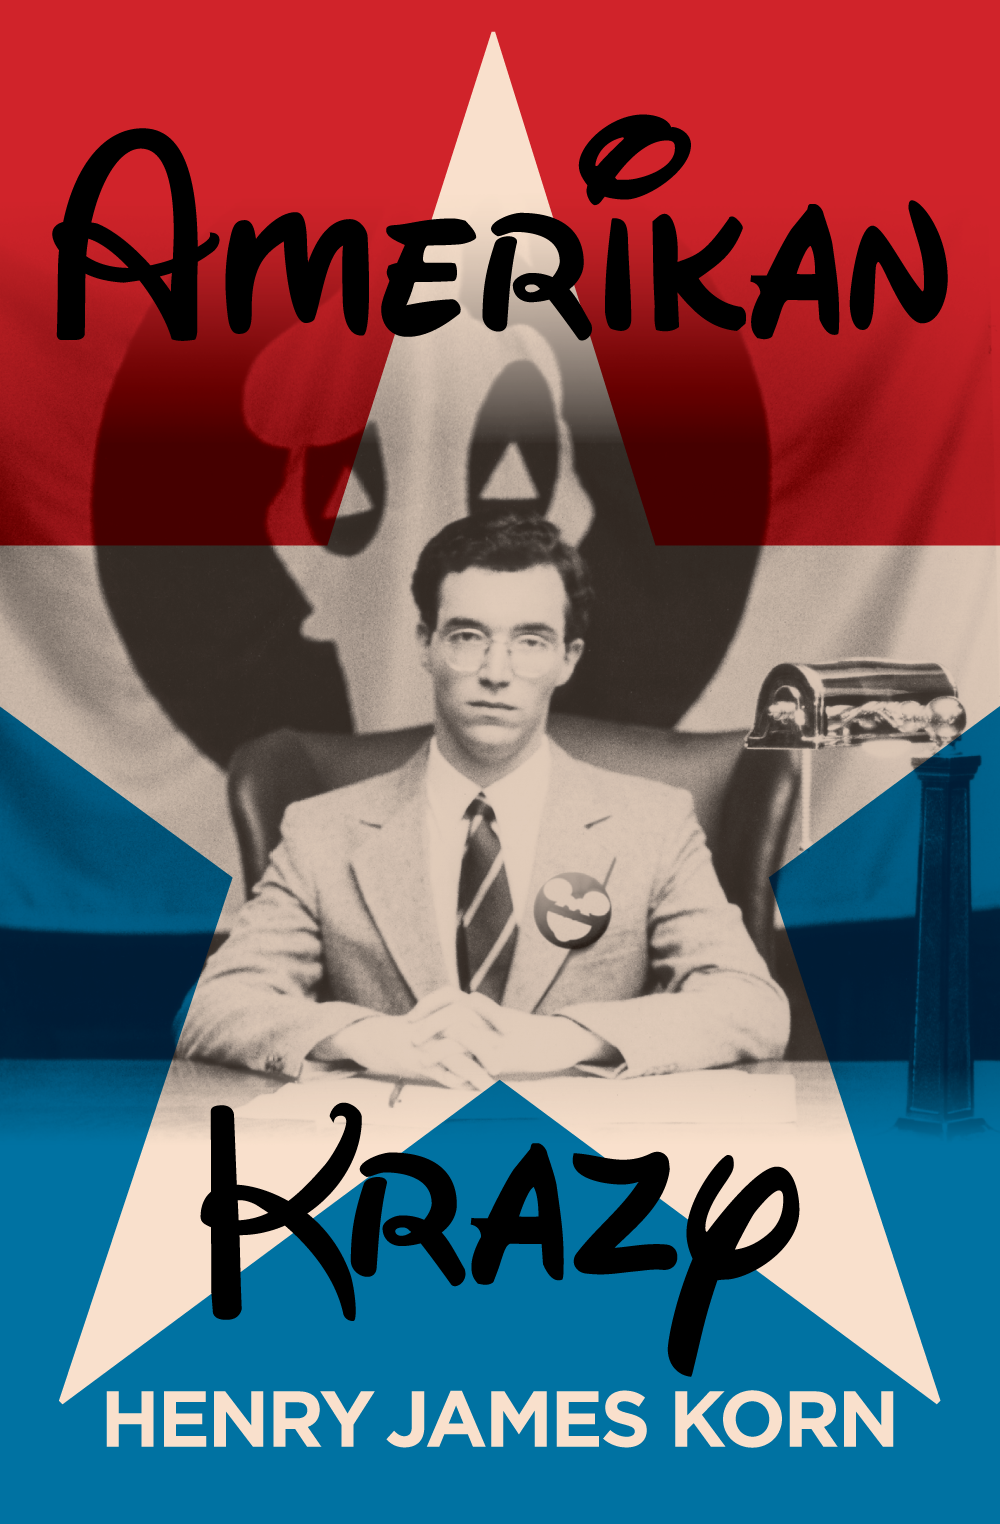 Henry James Korn's debut novel Amerikan Krazy